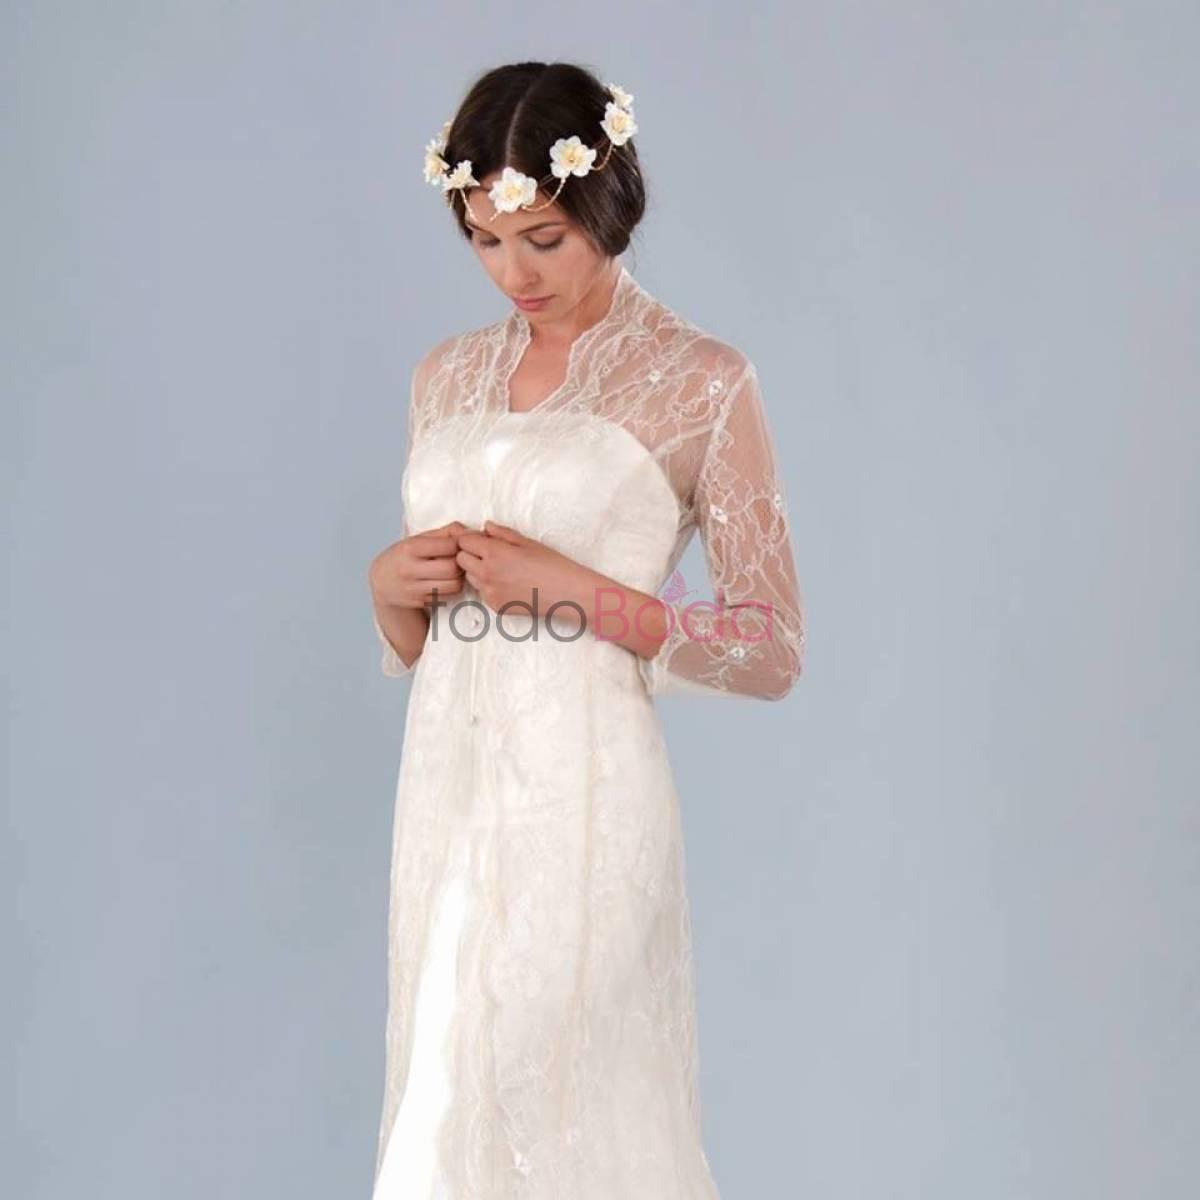 Enchanting Vestido Novia Madrid Images - All Wedding Dresses ...